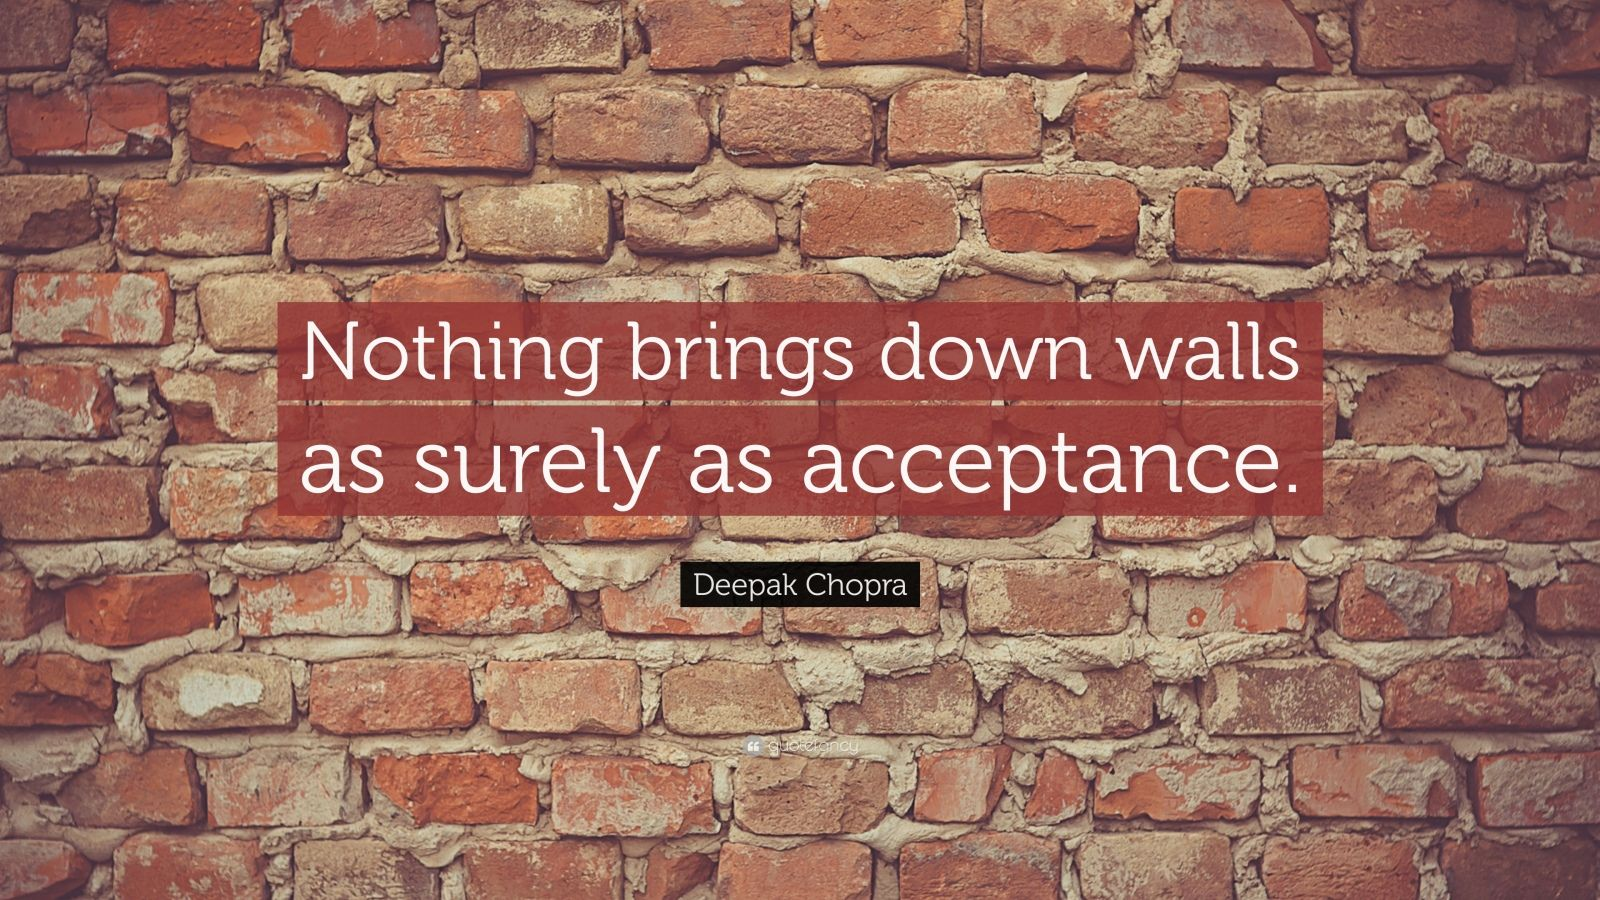 "Deepak Chopra Quote: ""Nothing brings down walls as surely as acceptance."""